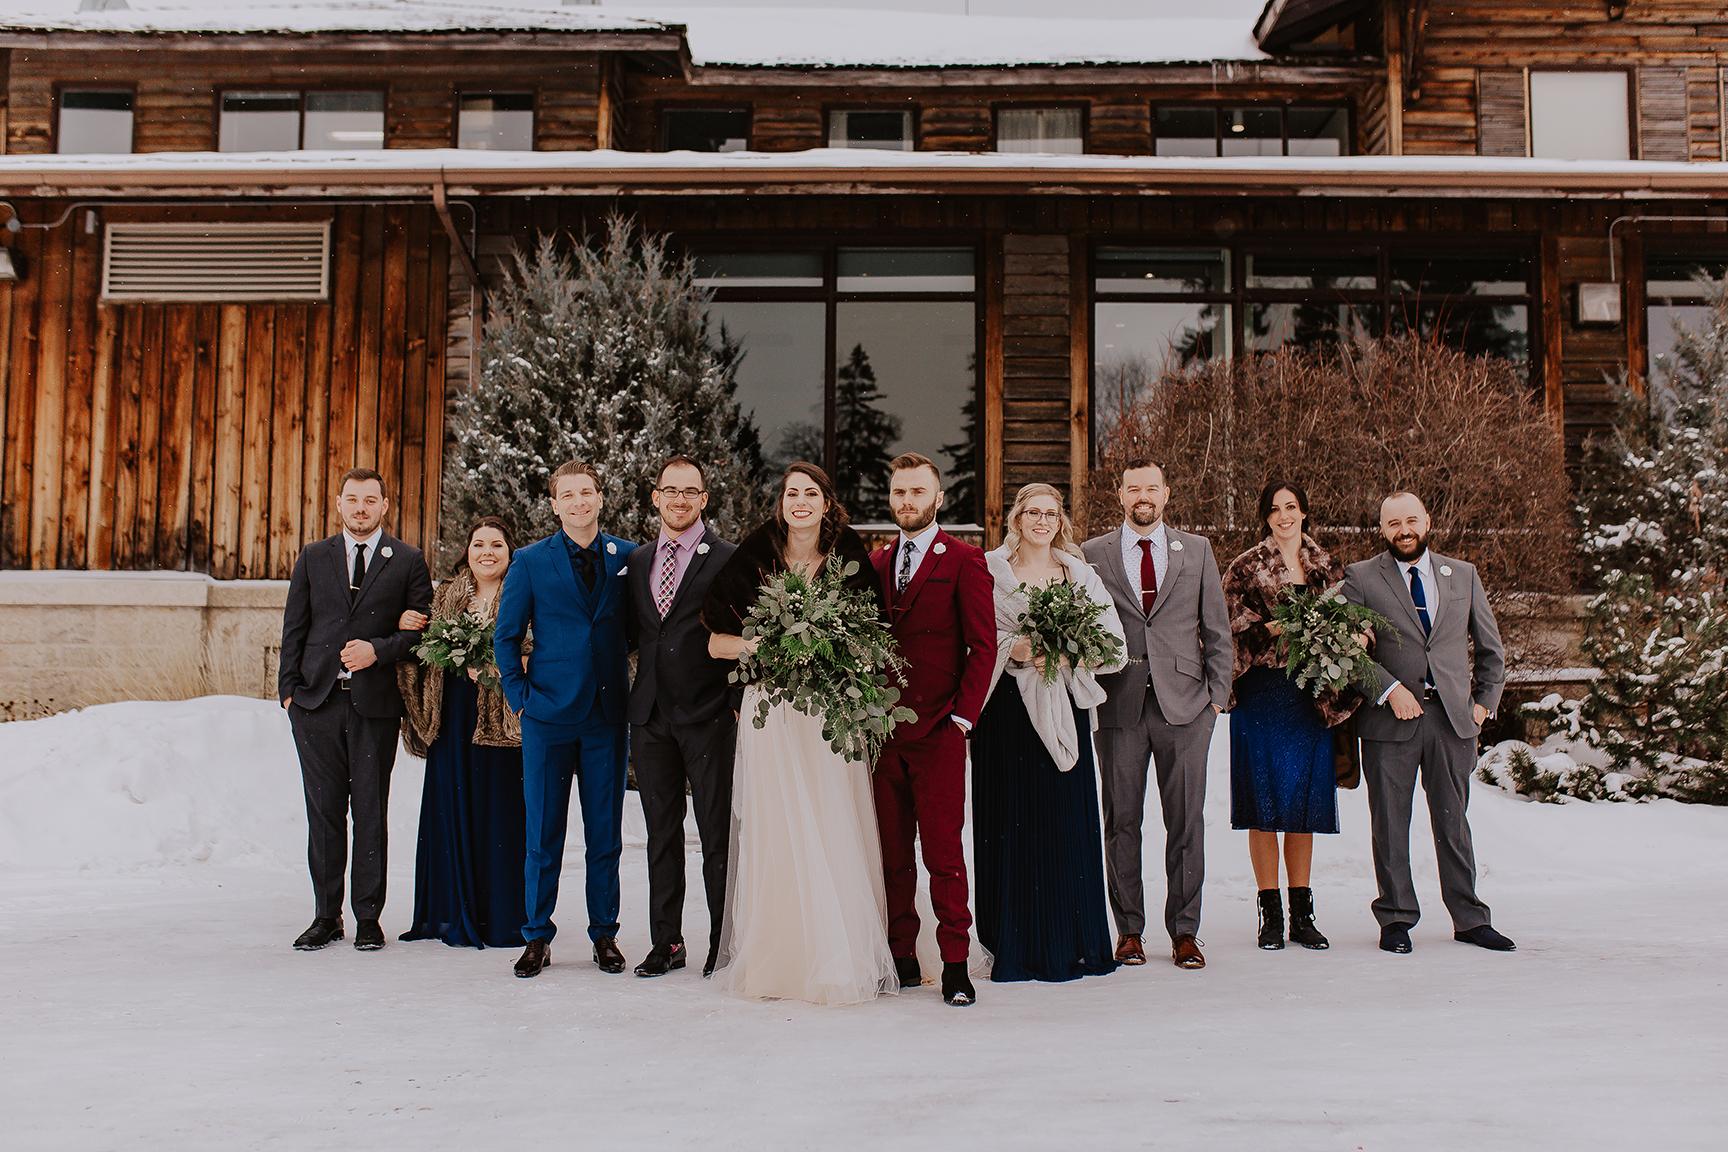 Wedding_Party_Formals_18_web.jpg